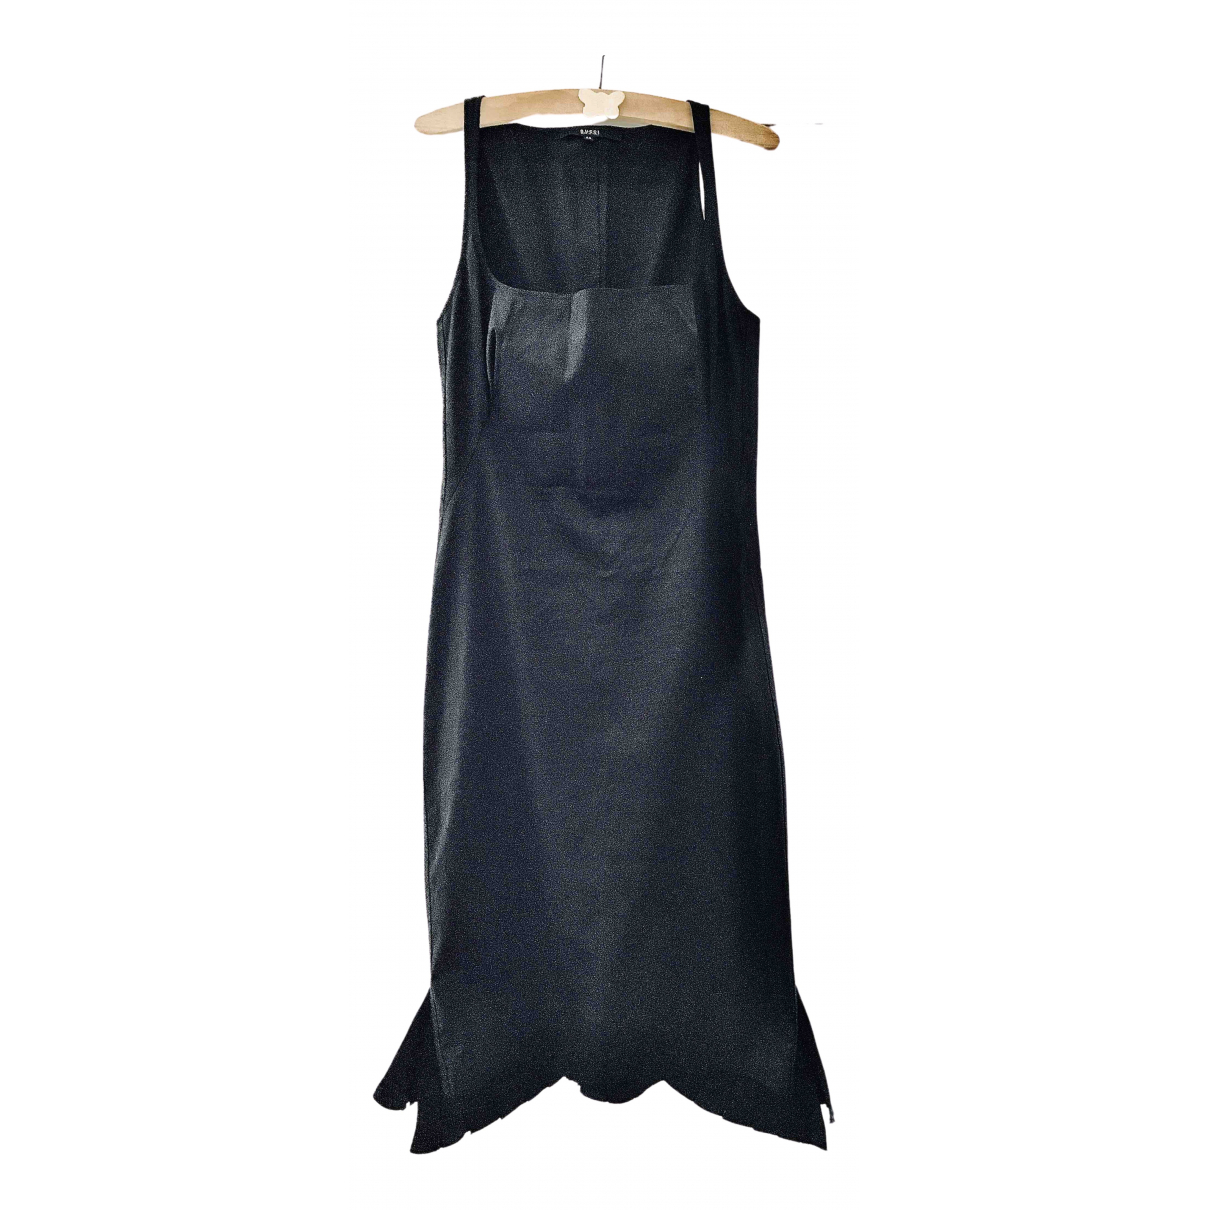 Gucci \N Black Cotton - elasthane dress for Women 44 IT